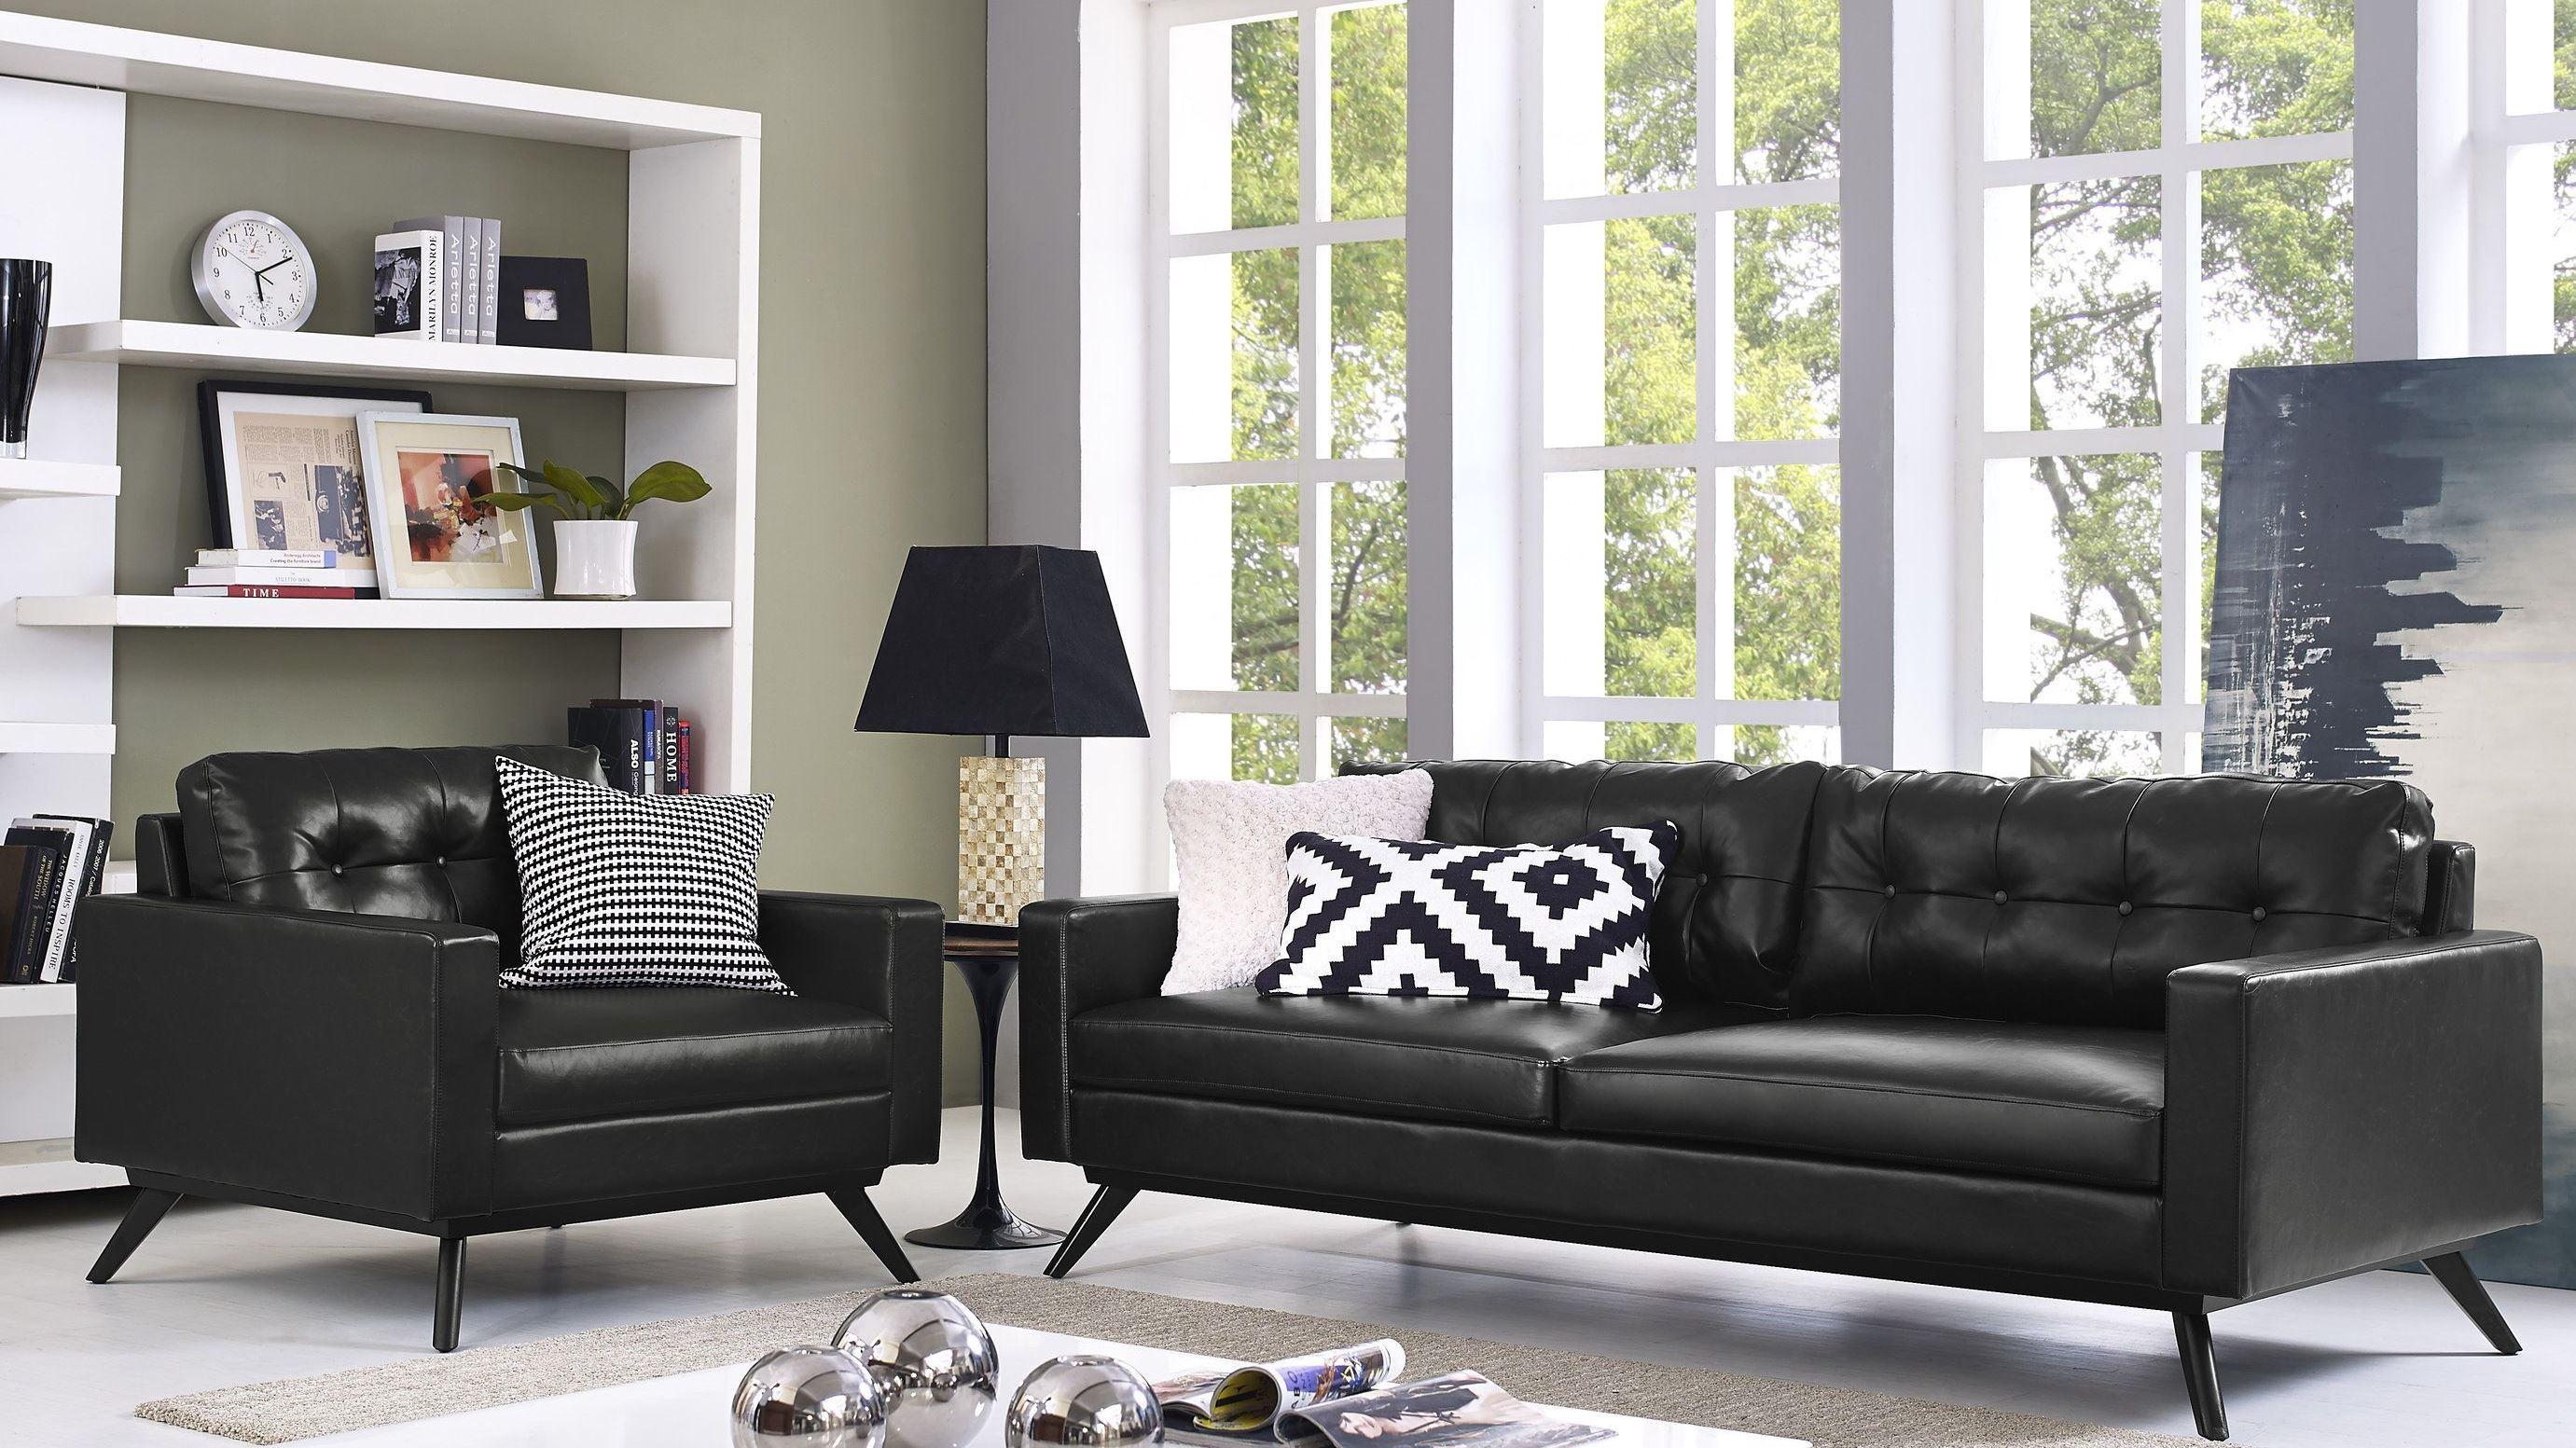 Cheap living room sets coleman autos weblog for Front room furniture